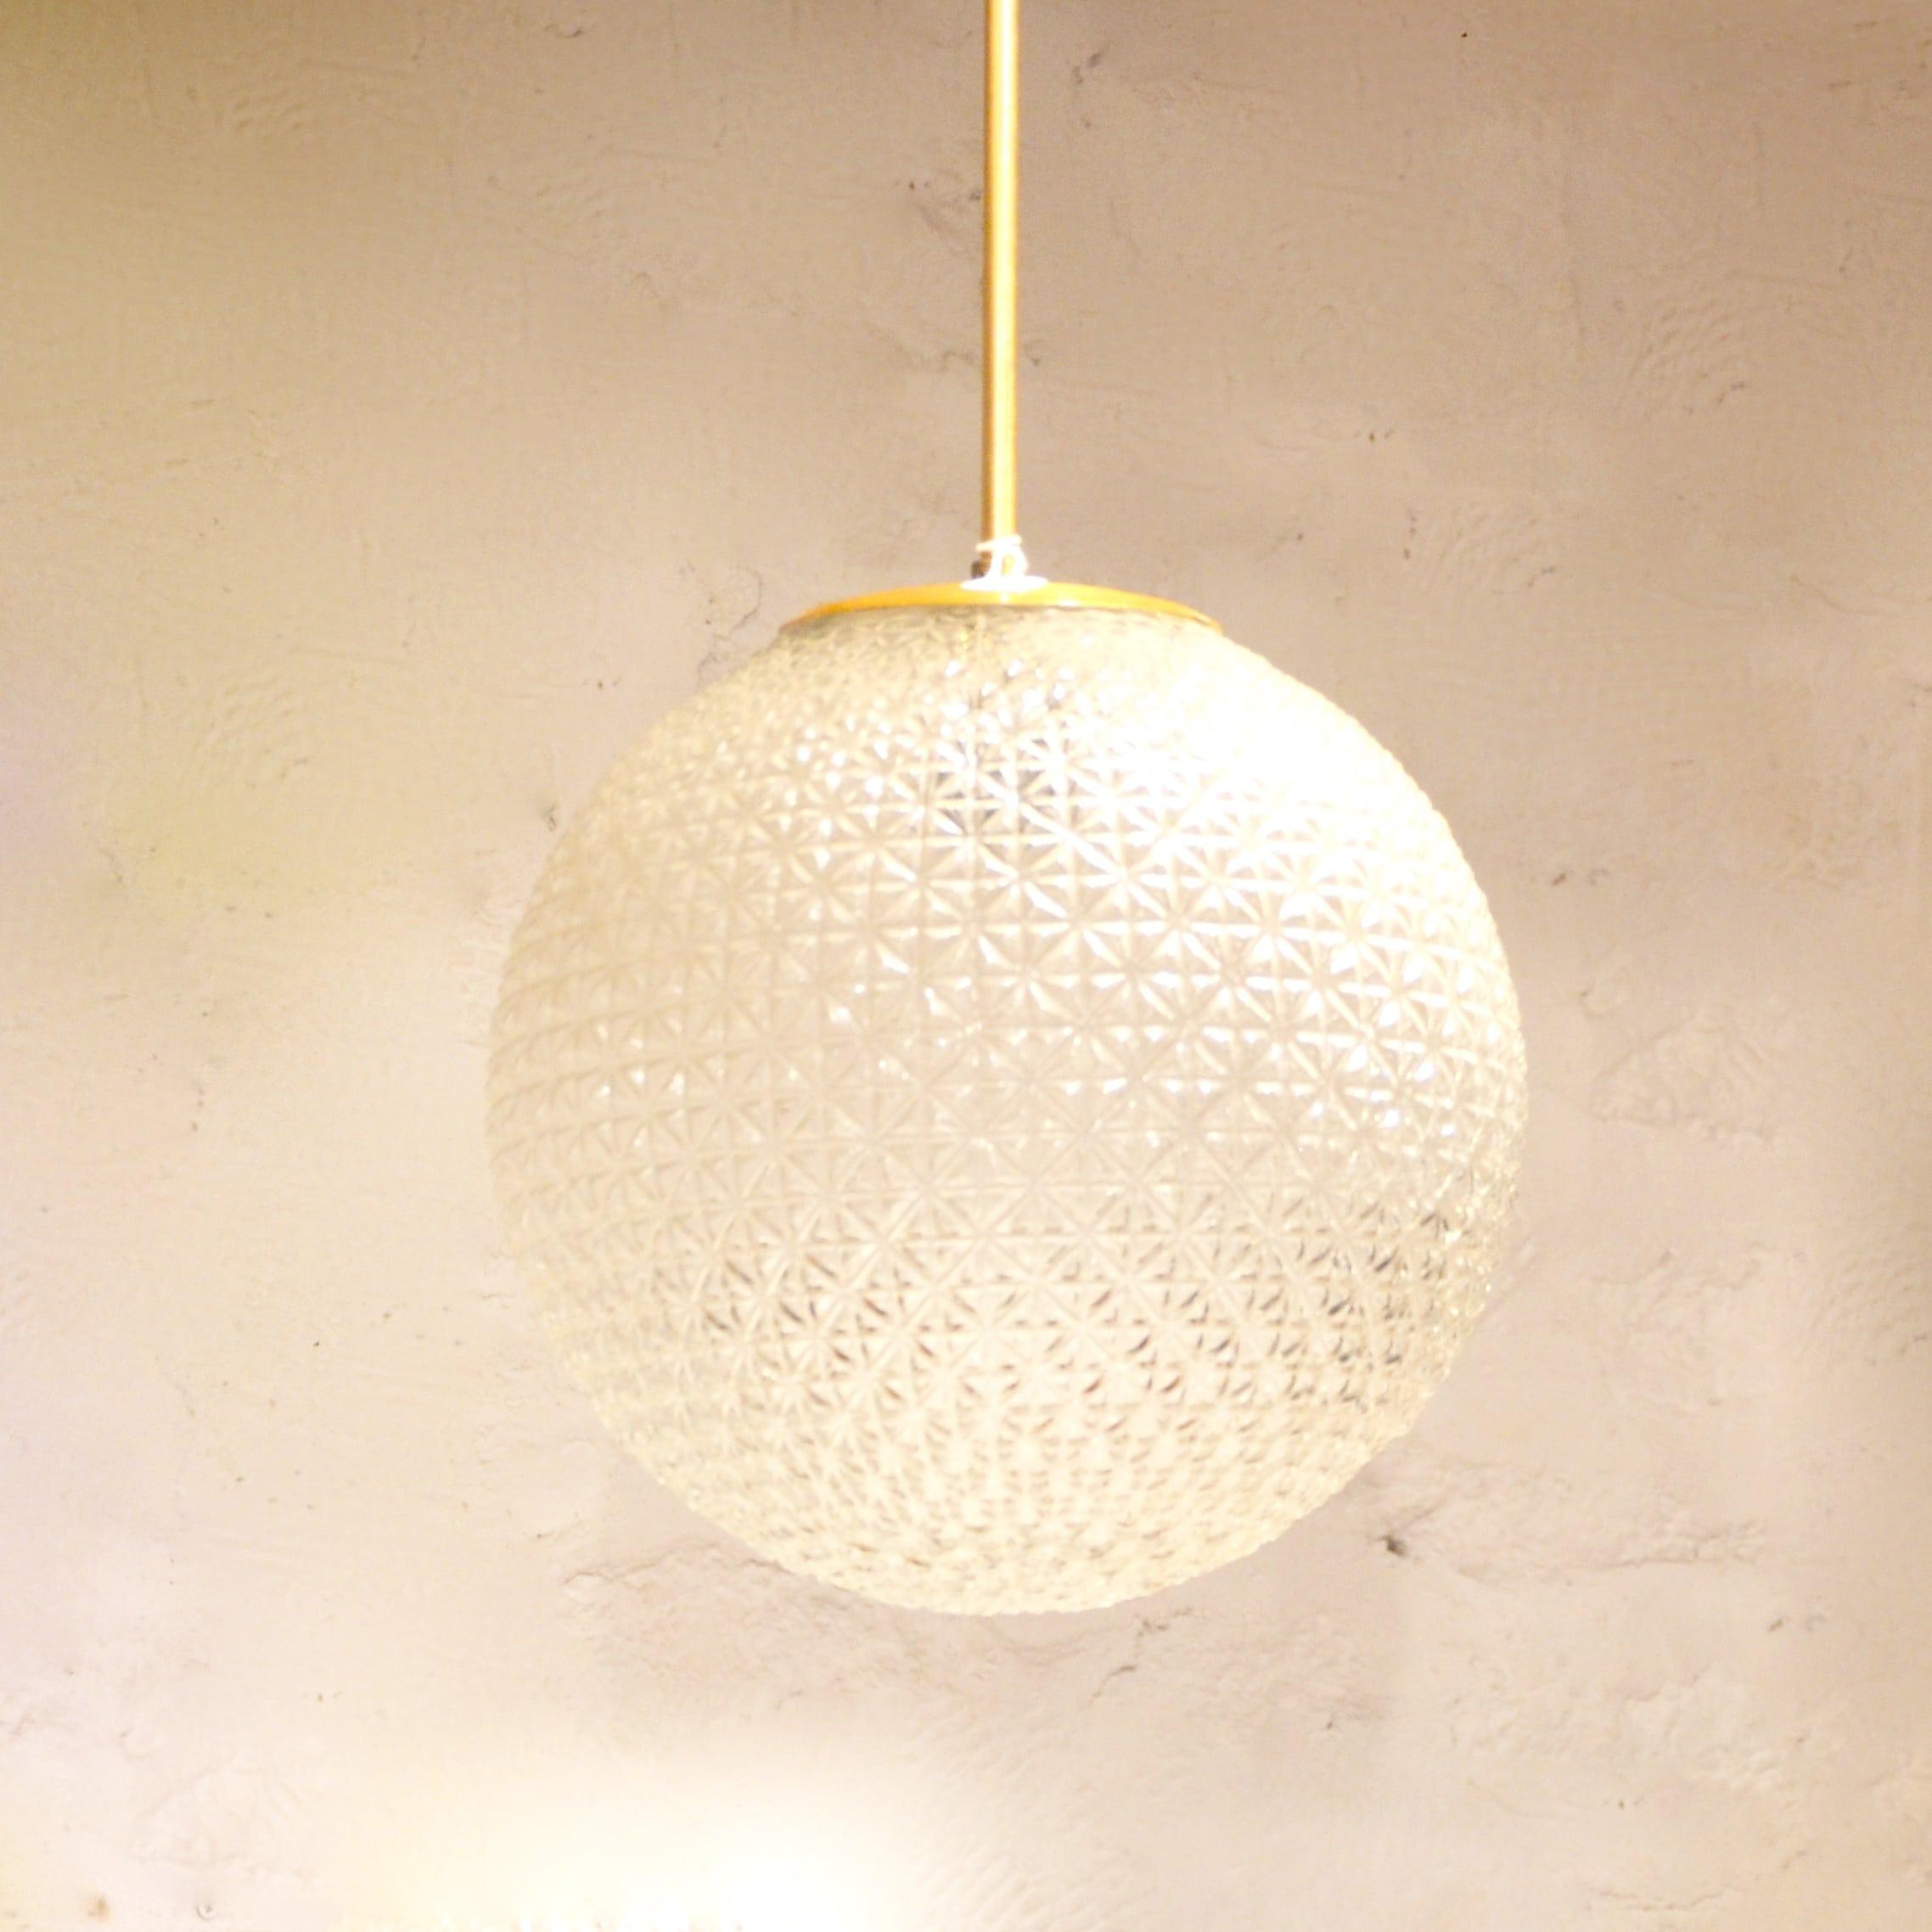 suspension boule de verre bindiesbindies. Black Bedroom Furniture Sets. Home Design Ideas